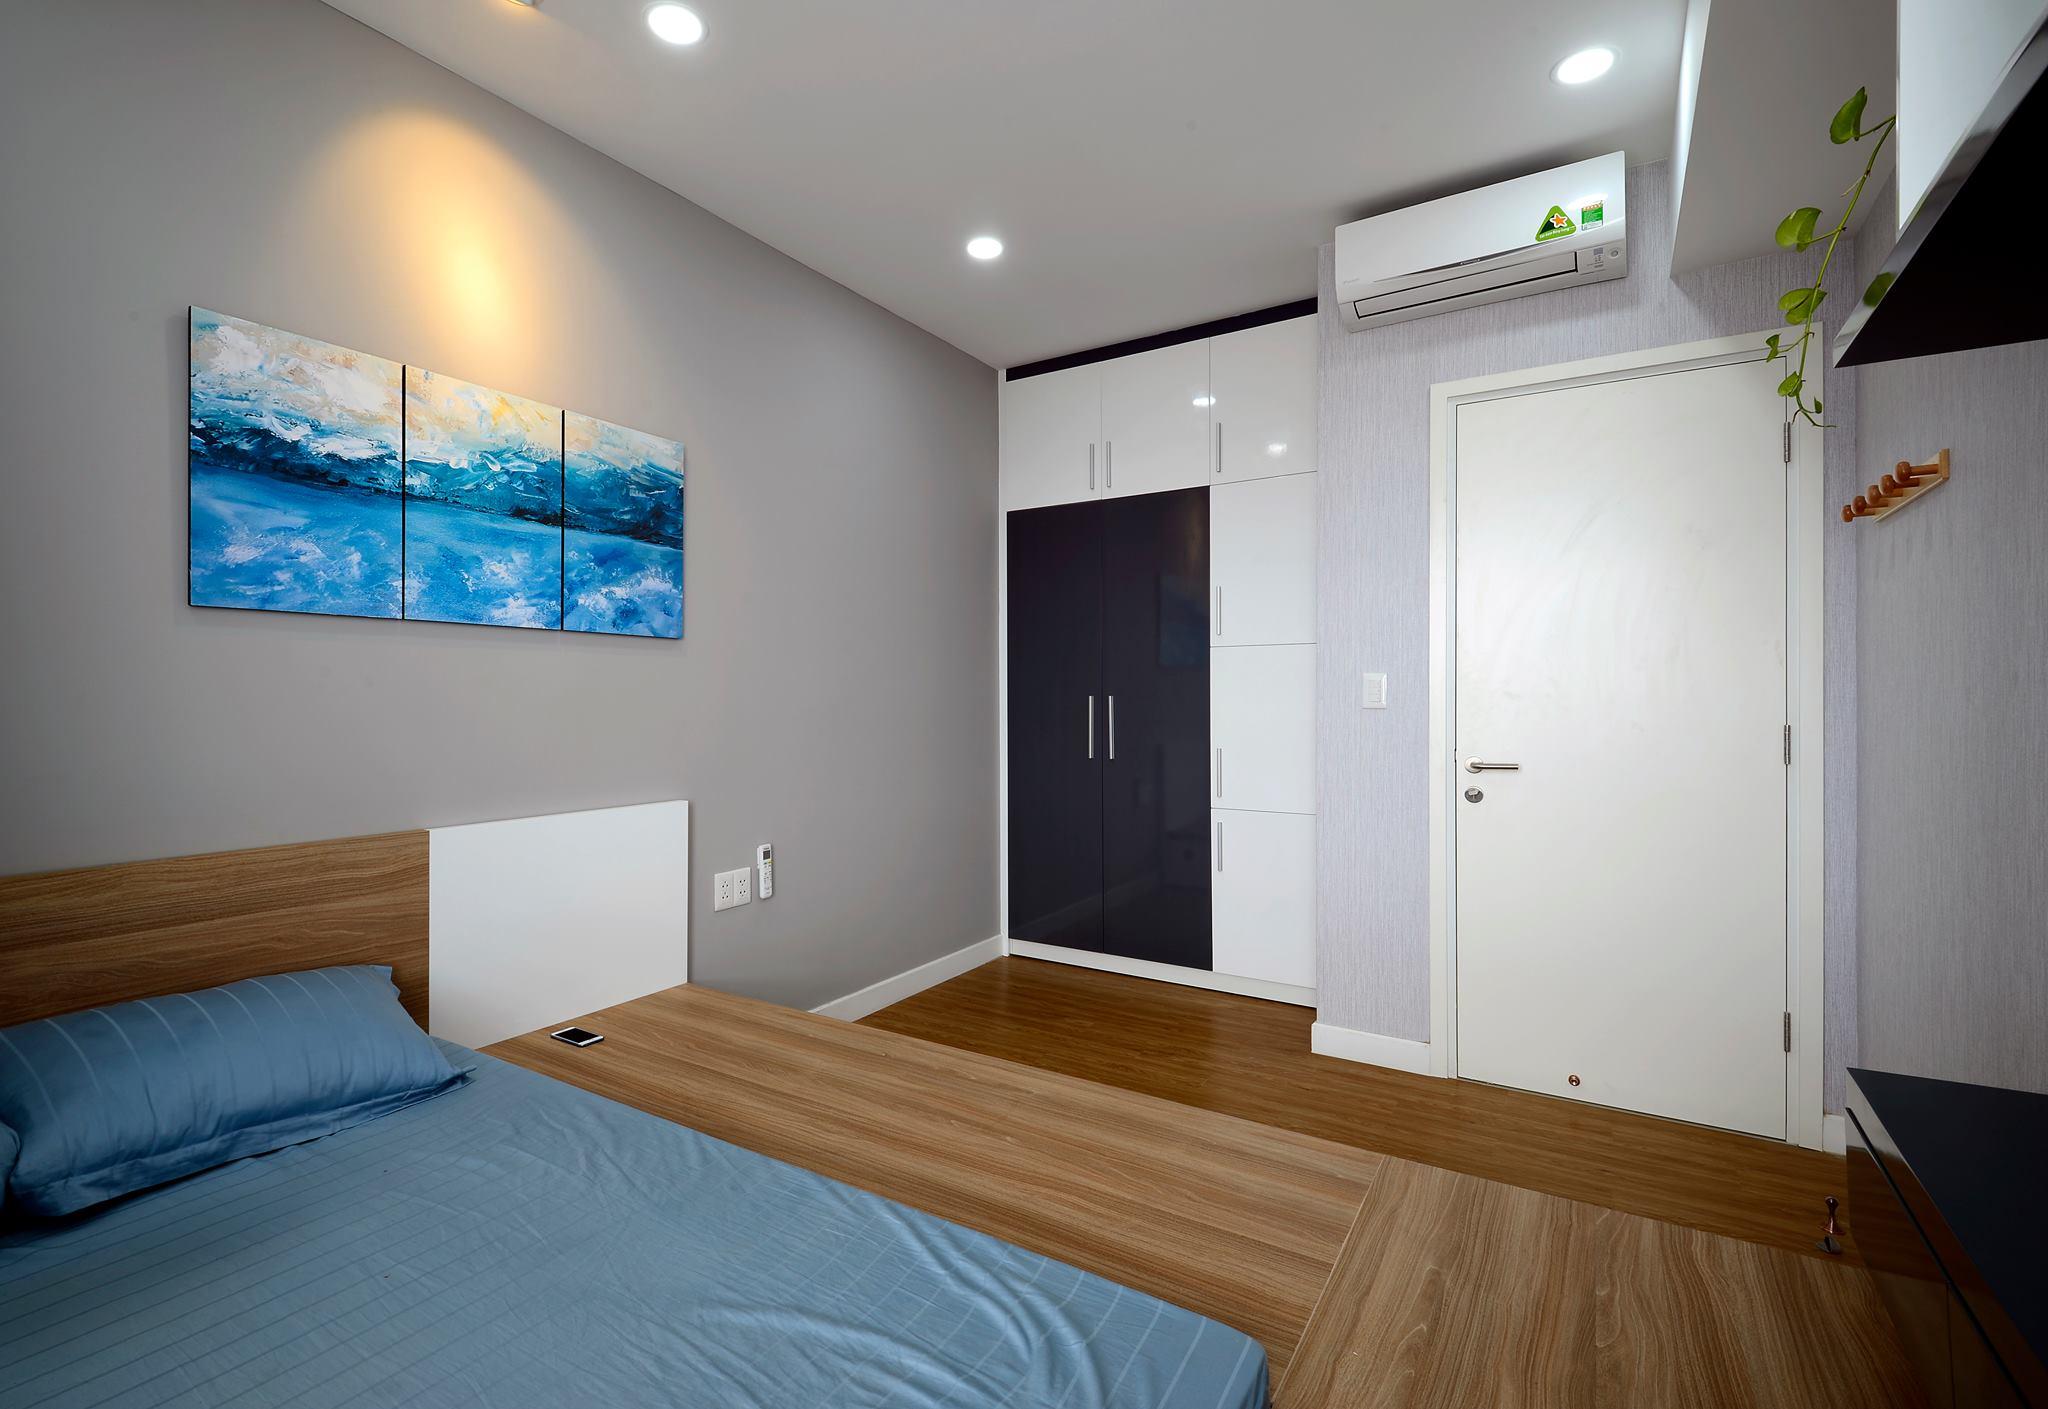 Nội thất căn hộ Masteri